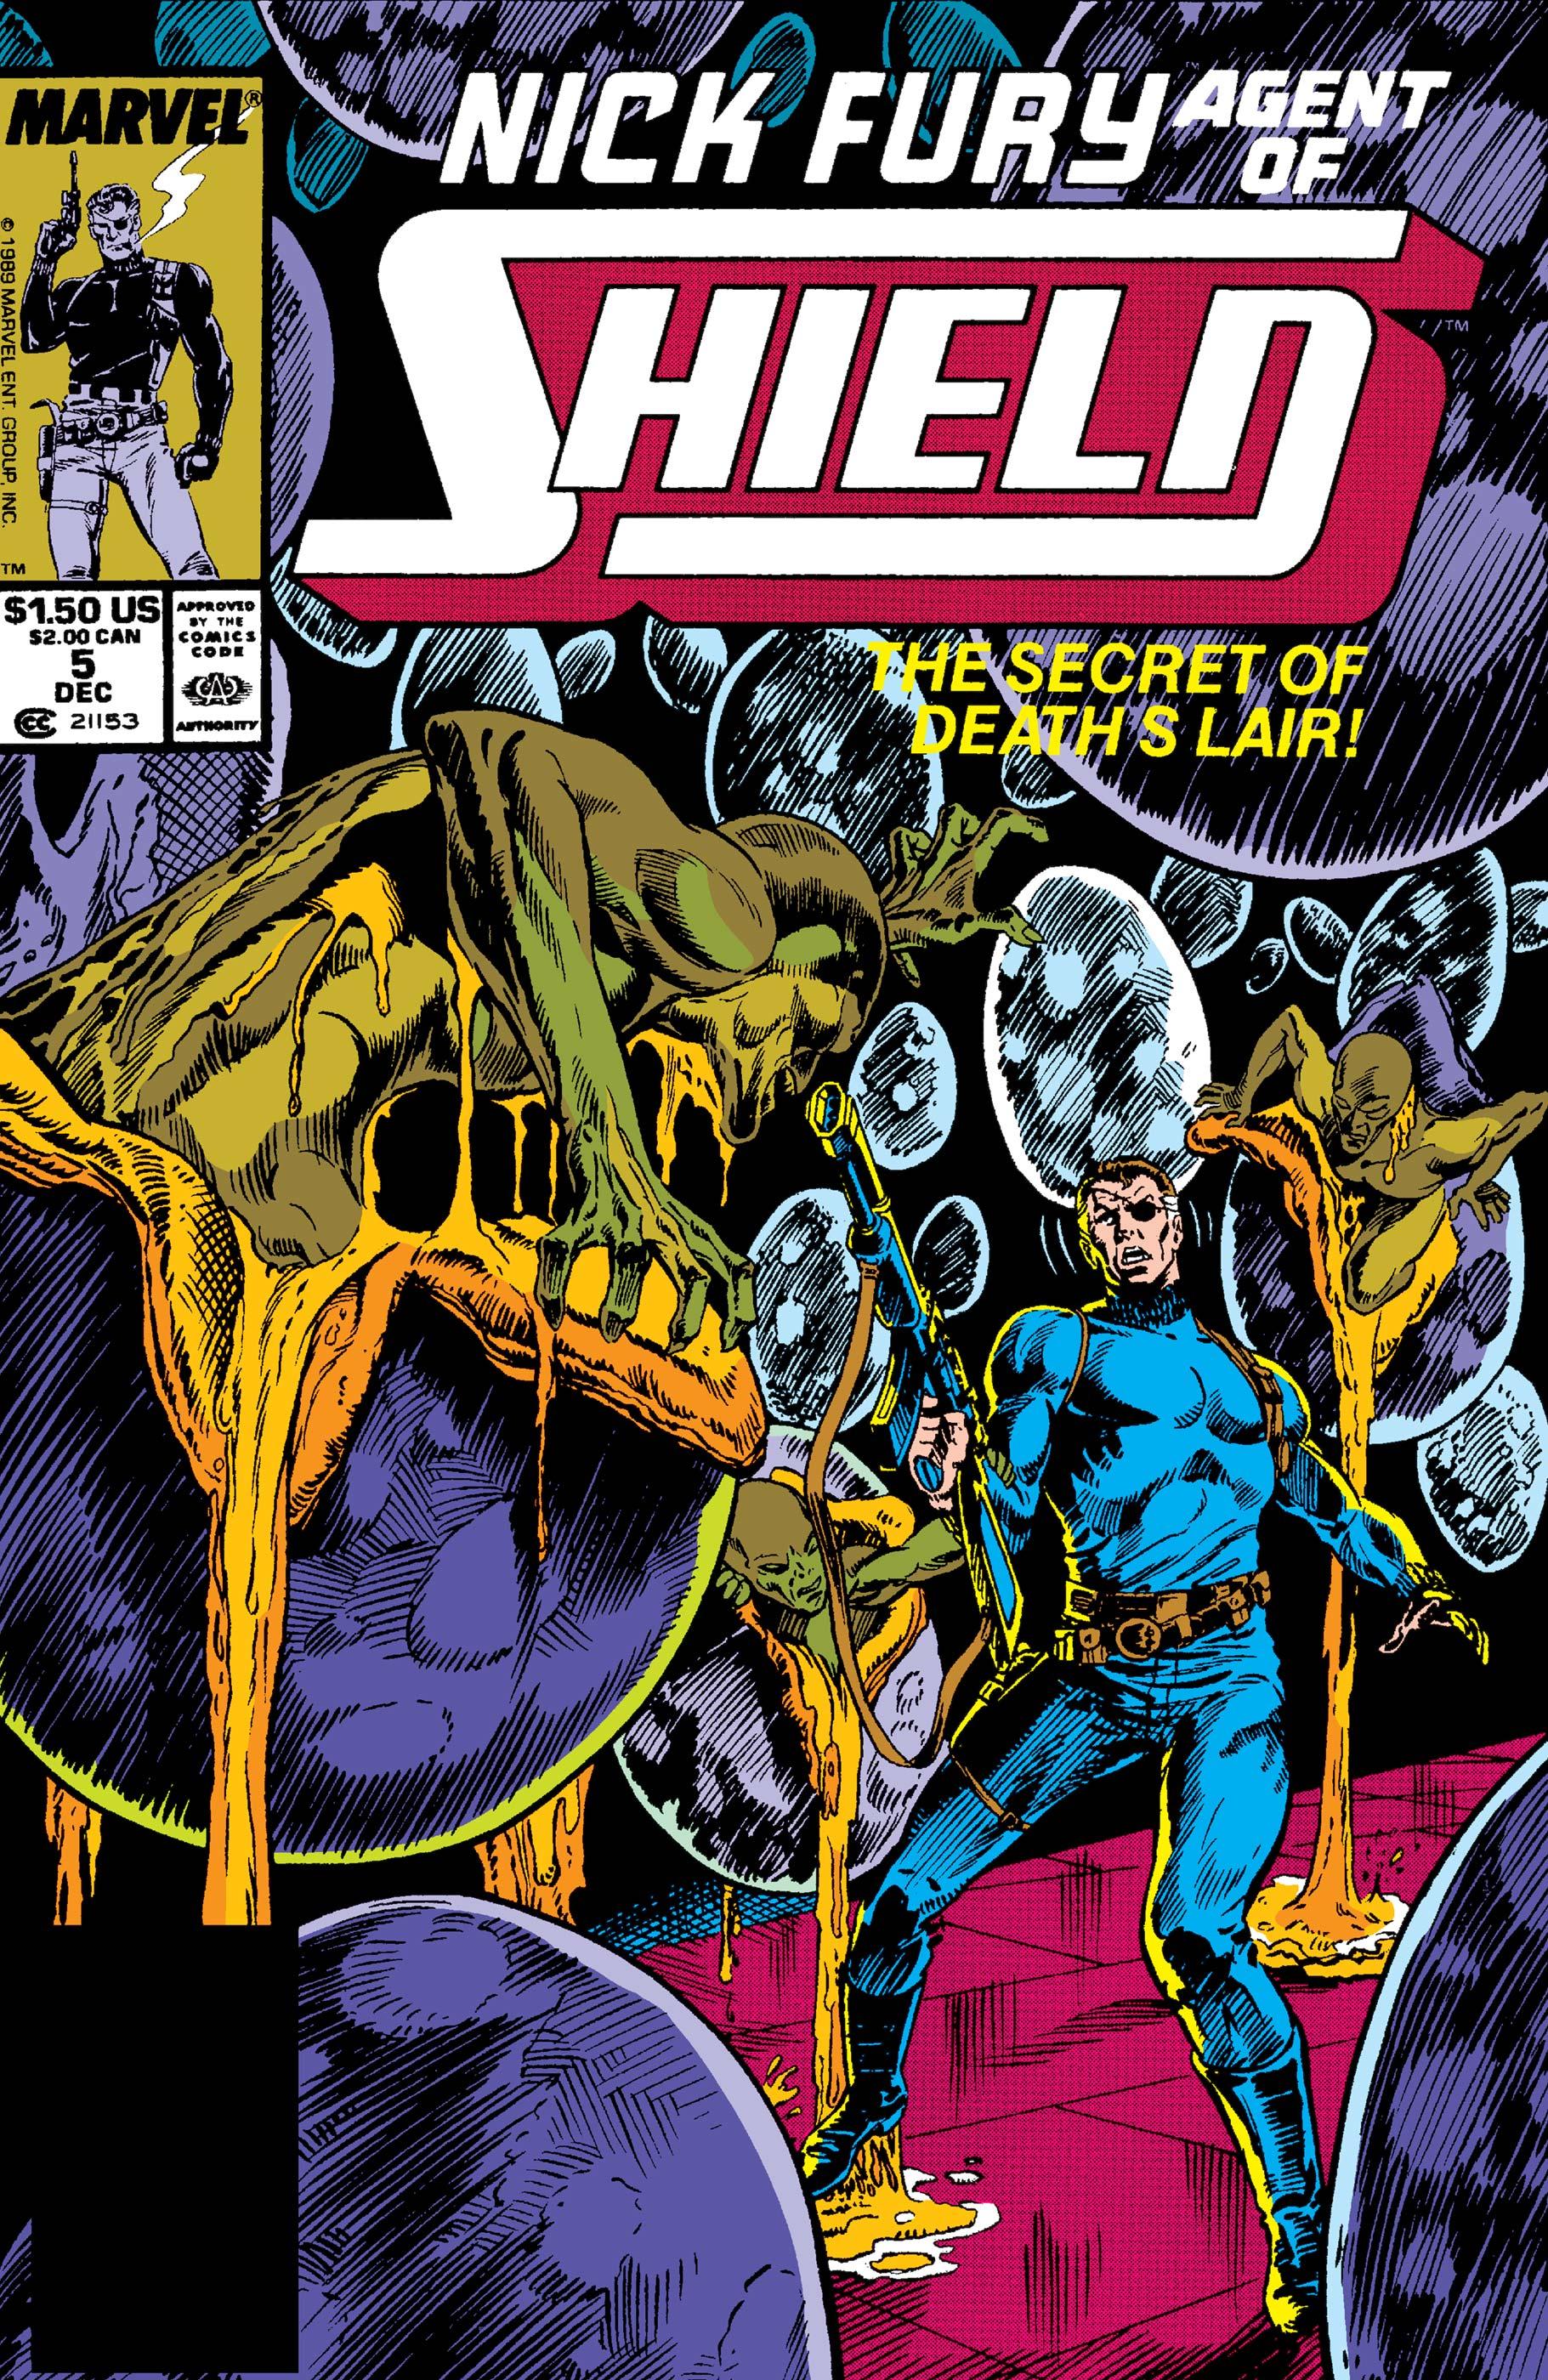 Nick Fury, Agent of S.H.I.E.L.D. (1989) #5